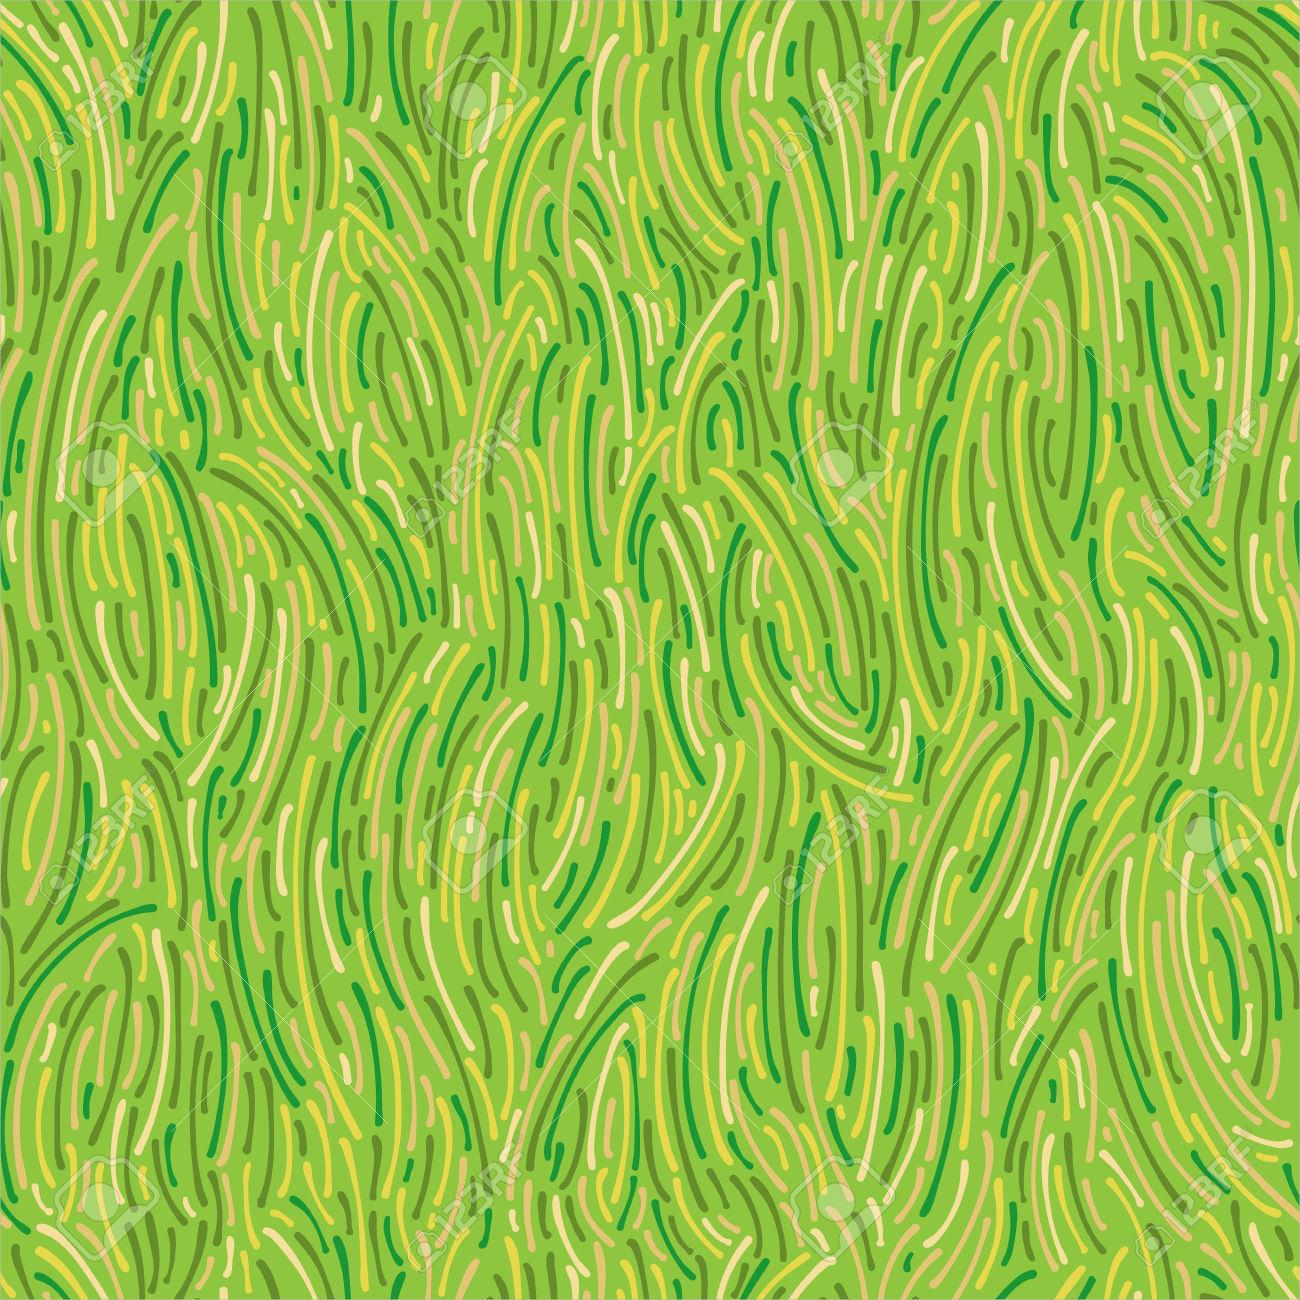 retro grass texture1